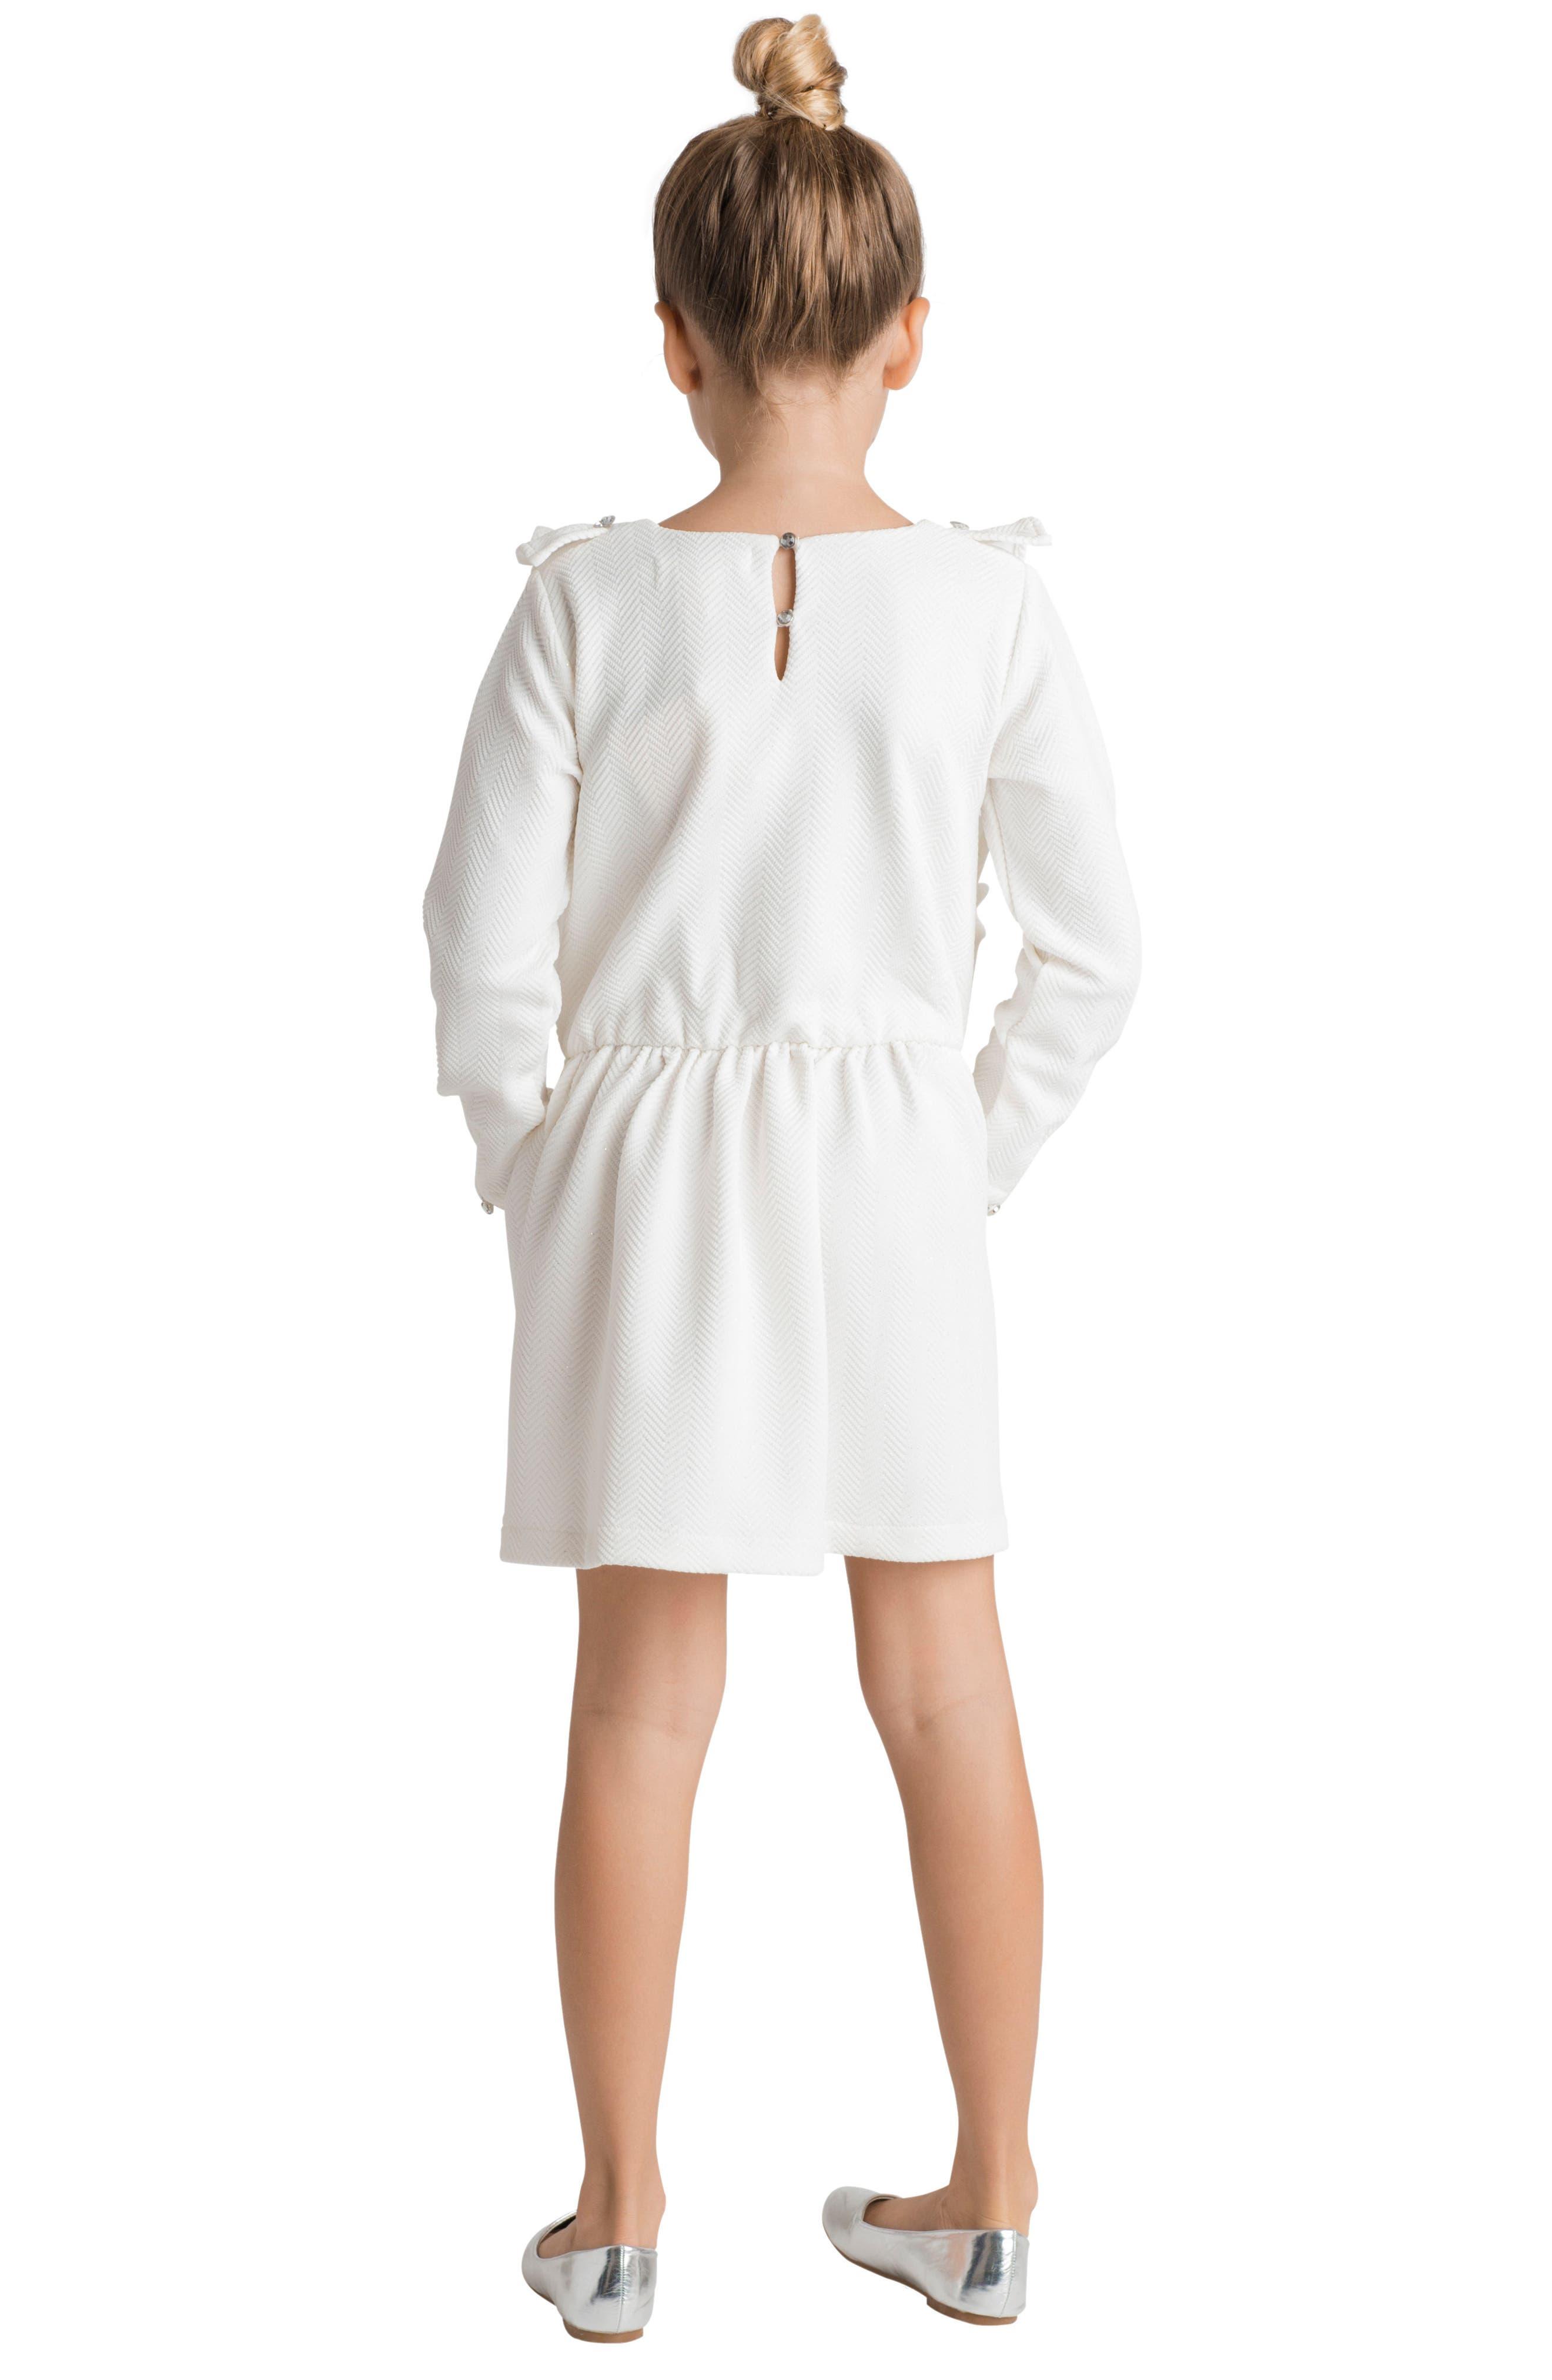 Fantasia Dress,                             Alternate thumbnail 4, color,                             901